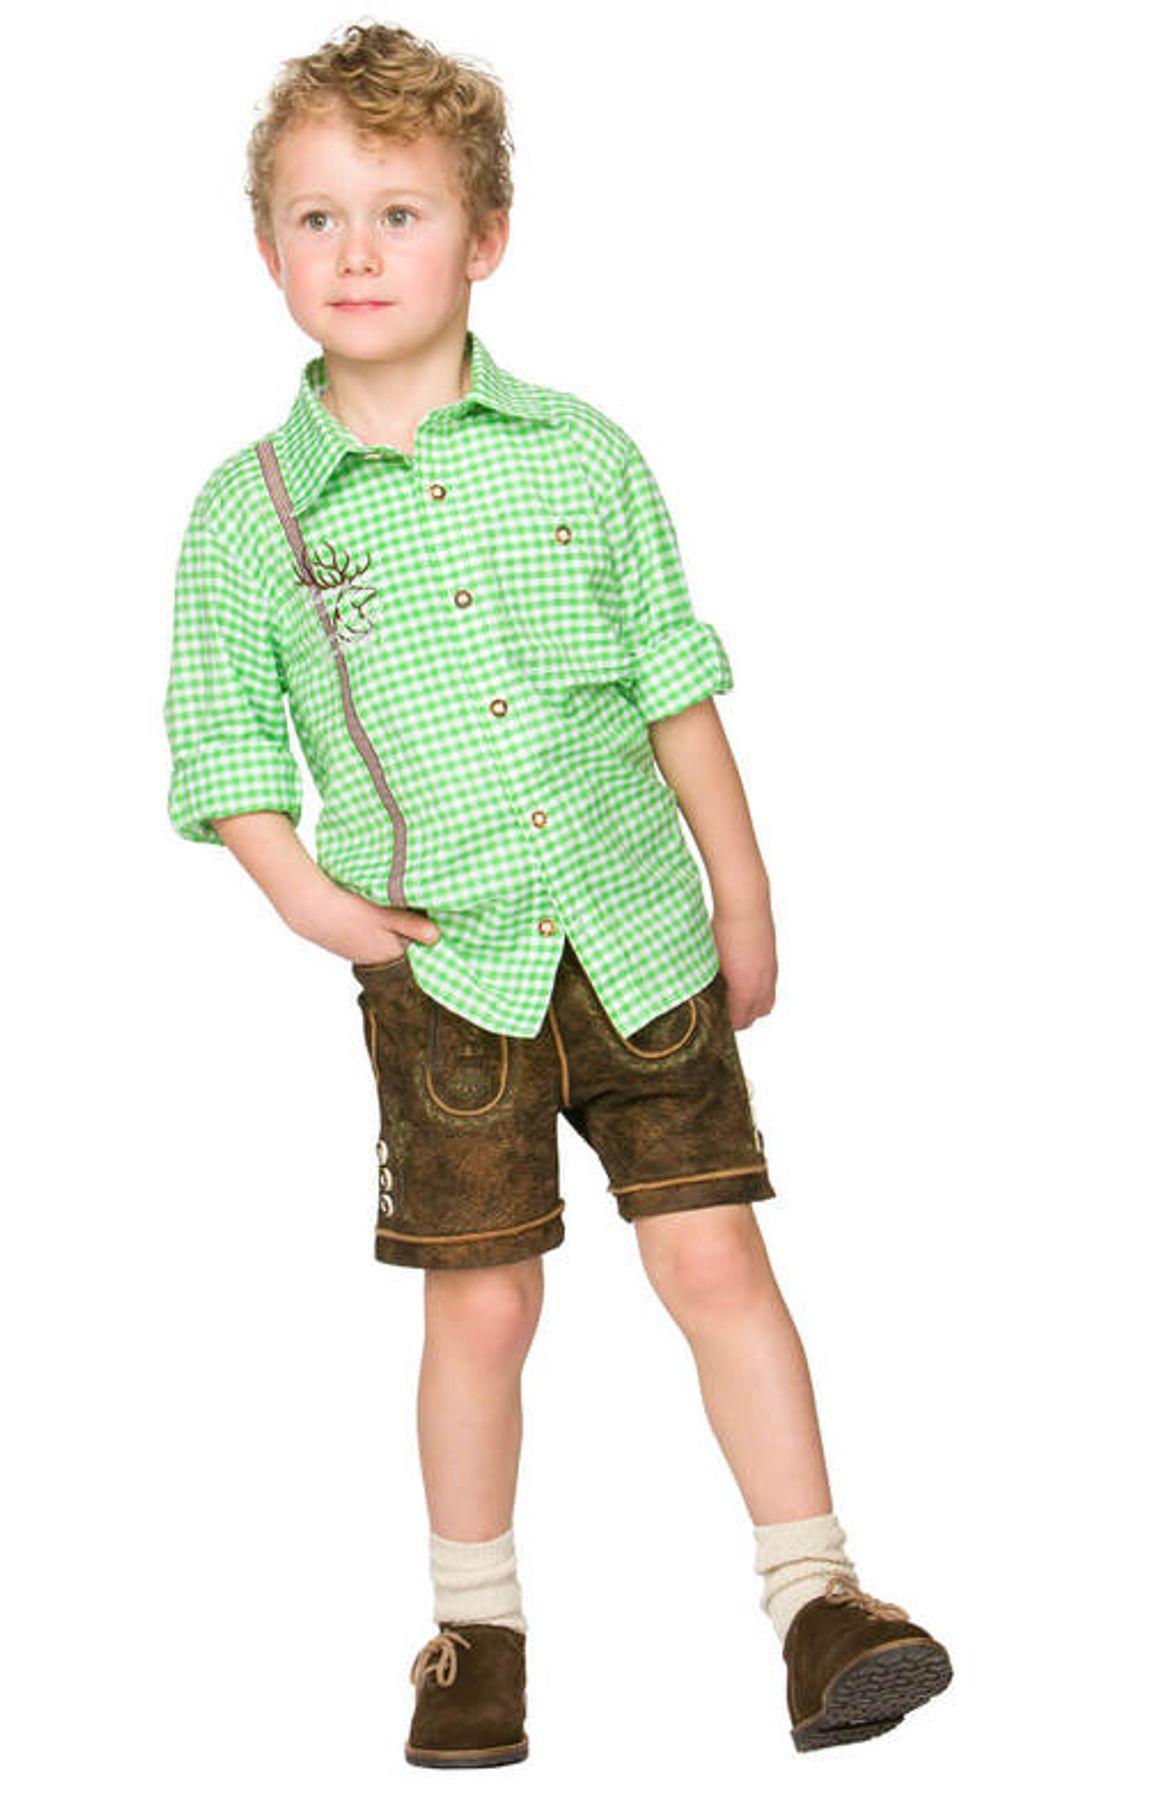 Stockerpoint - Kinder Trachten Hemd Leo, Gr. 122-152 – Bild 4